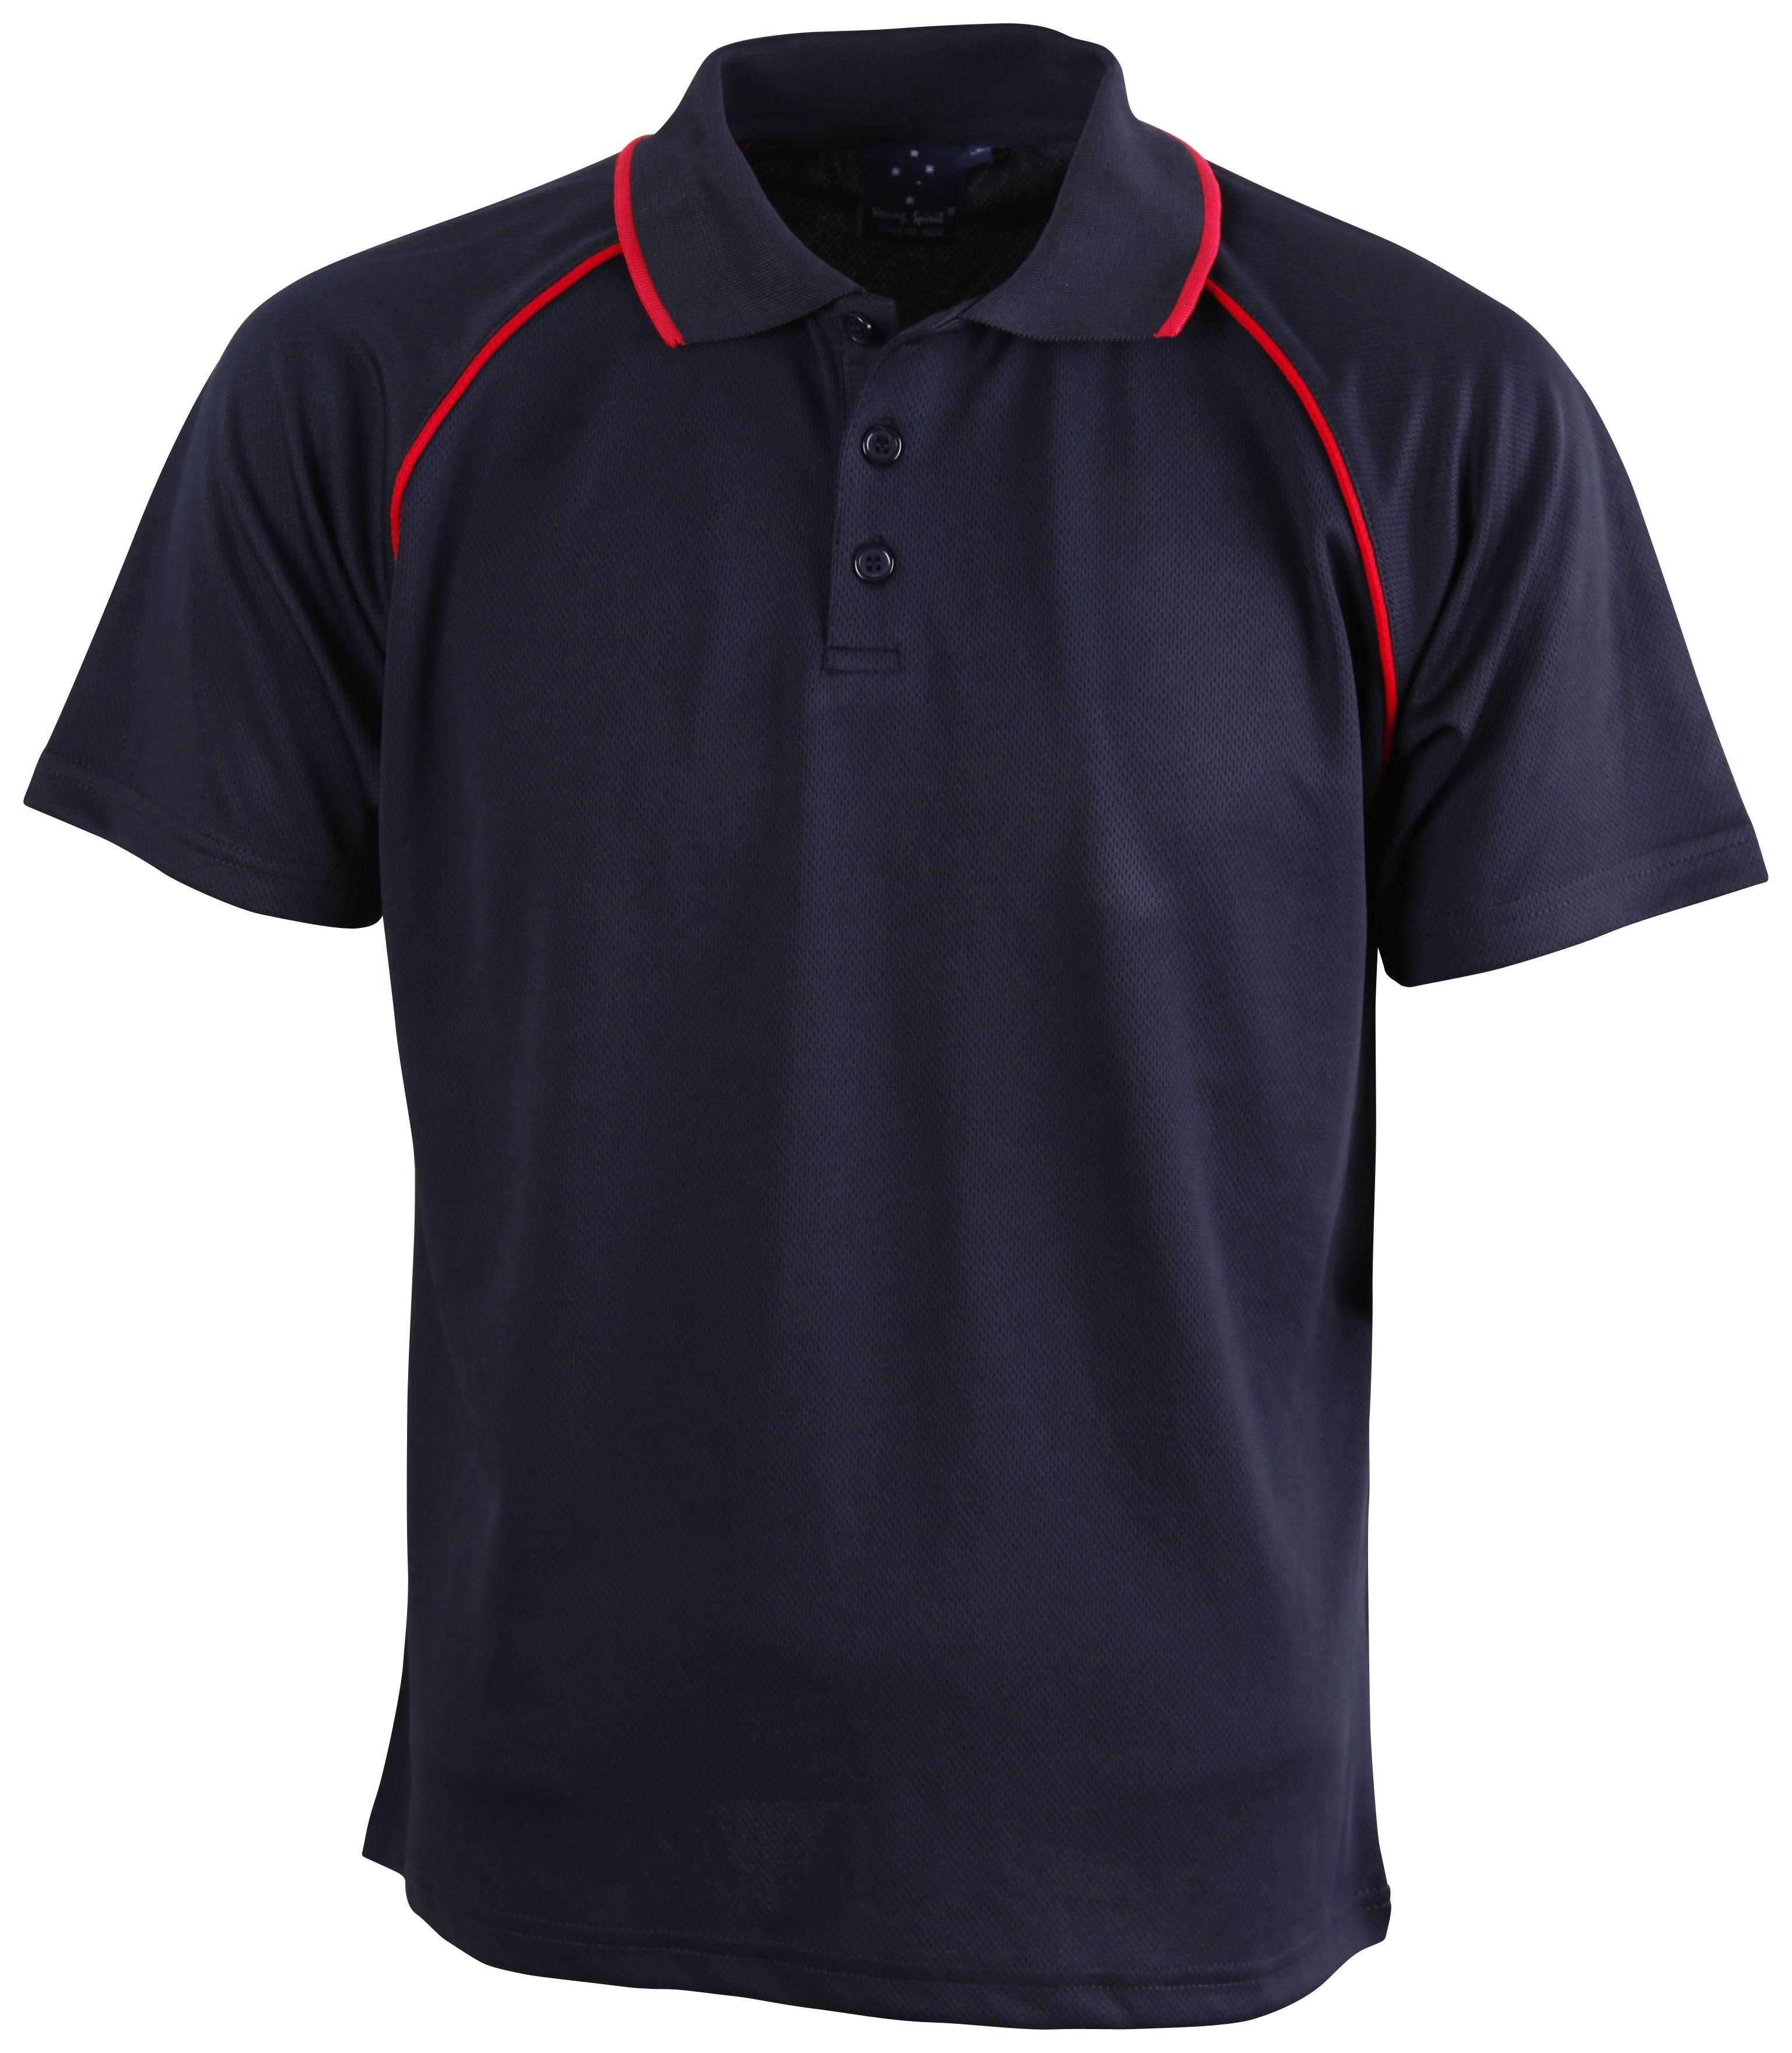 WS Sportswear Mens tops, Sportswear, Mens polo shirts